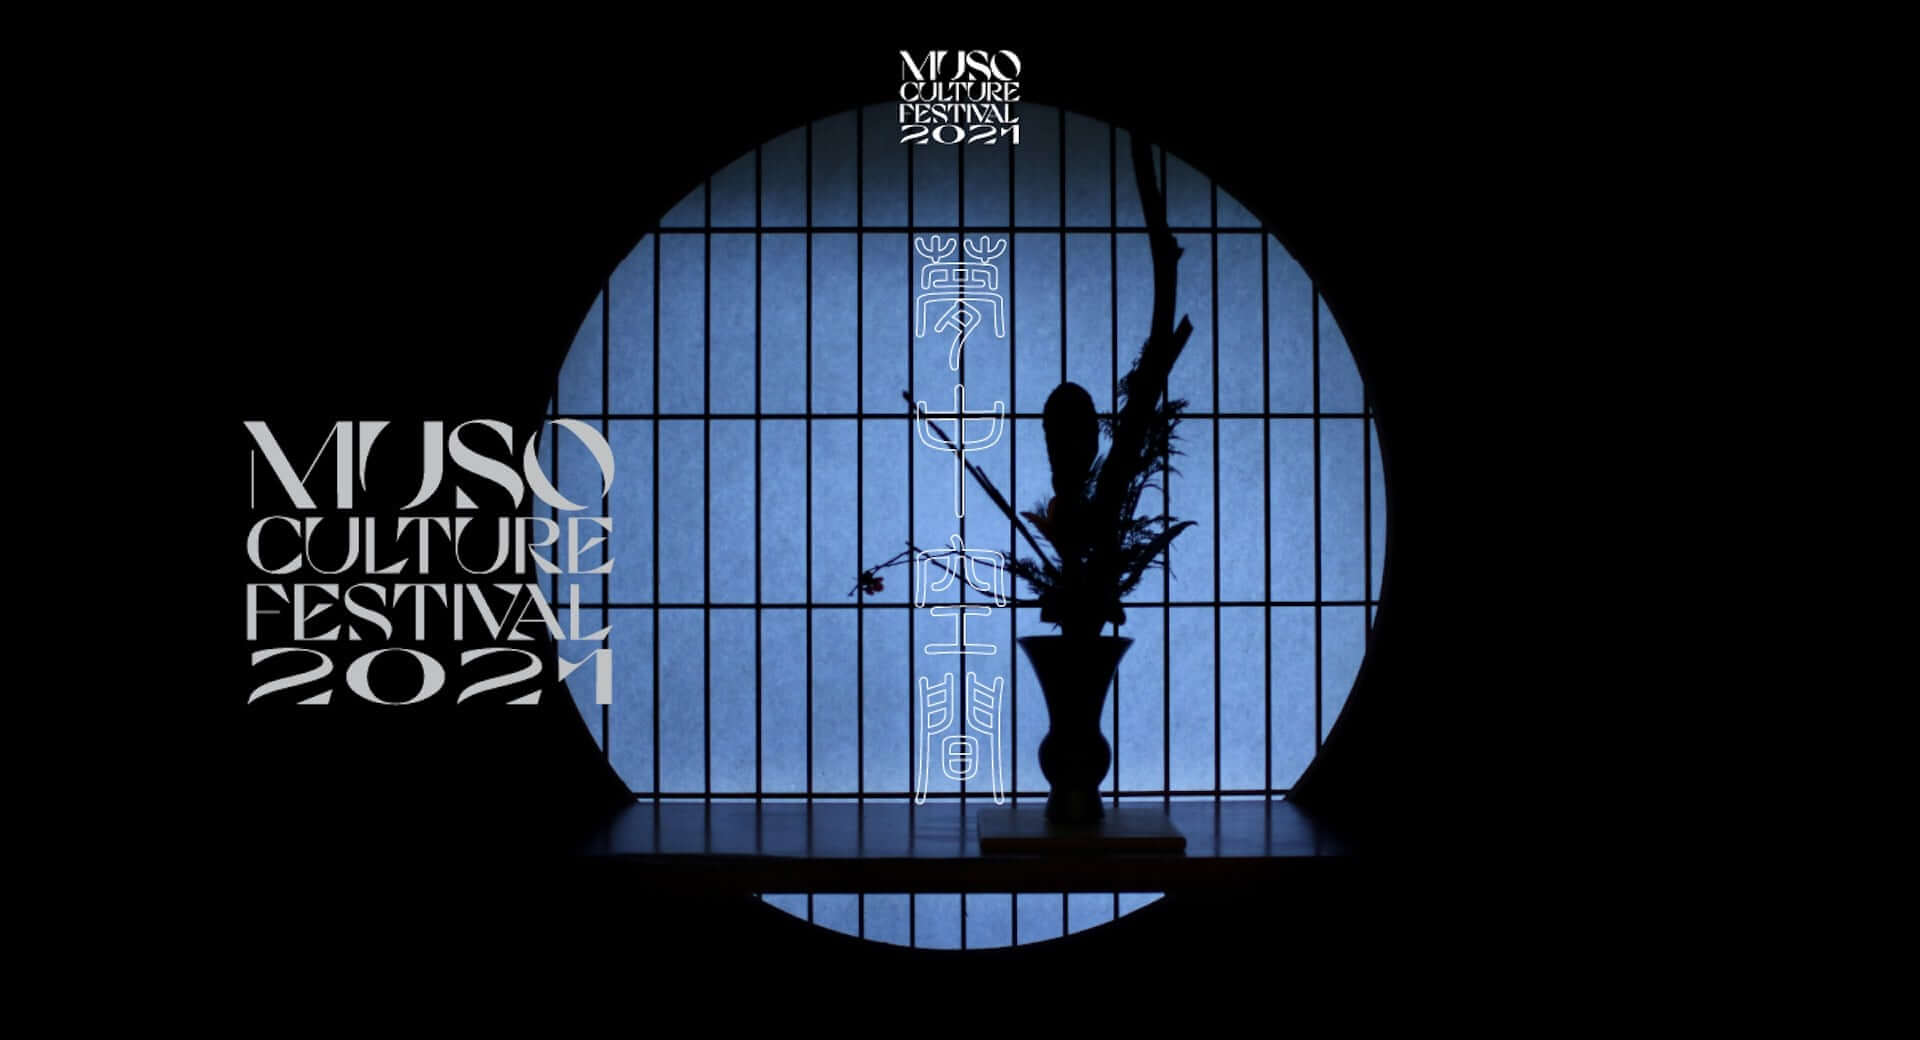 <MUSO Culture Festival>のメイン会場がバーチャル大中寺に変更!Kaoru Inoue、ELLI ARAKAWAらのスペシャルミックスも公開決定 music210129_muso-festival_main-1920x1040